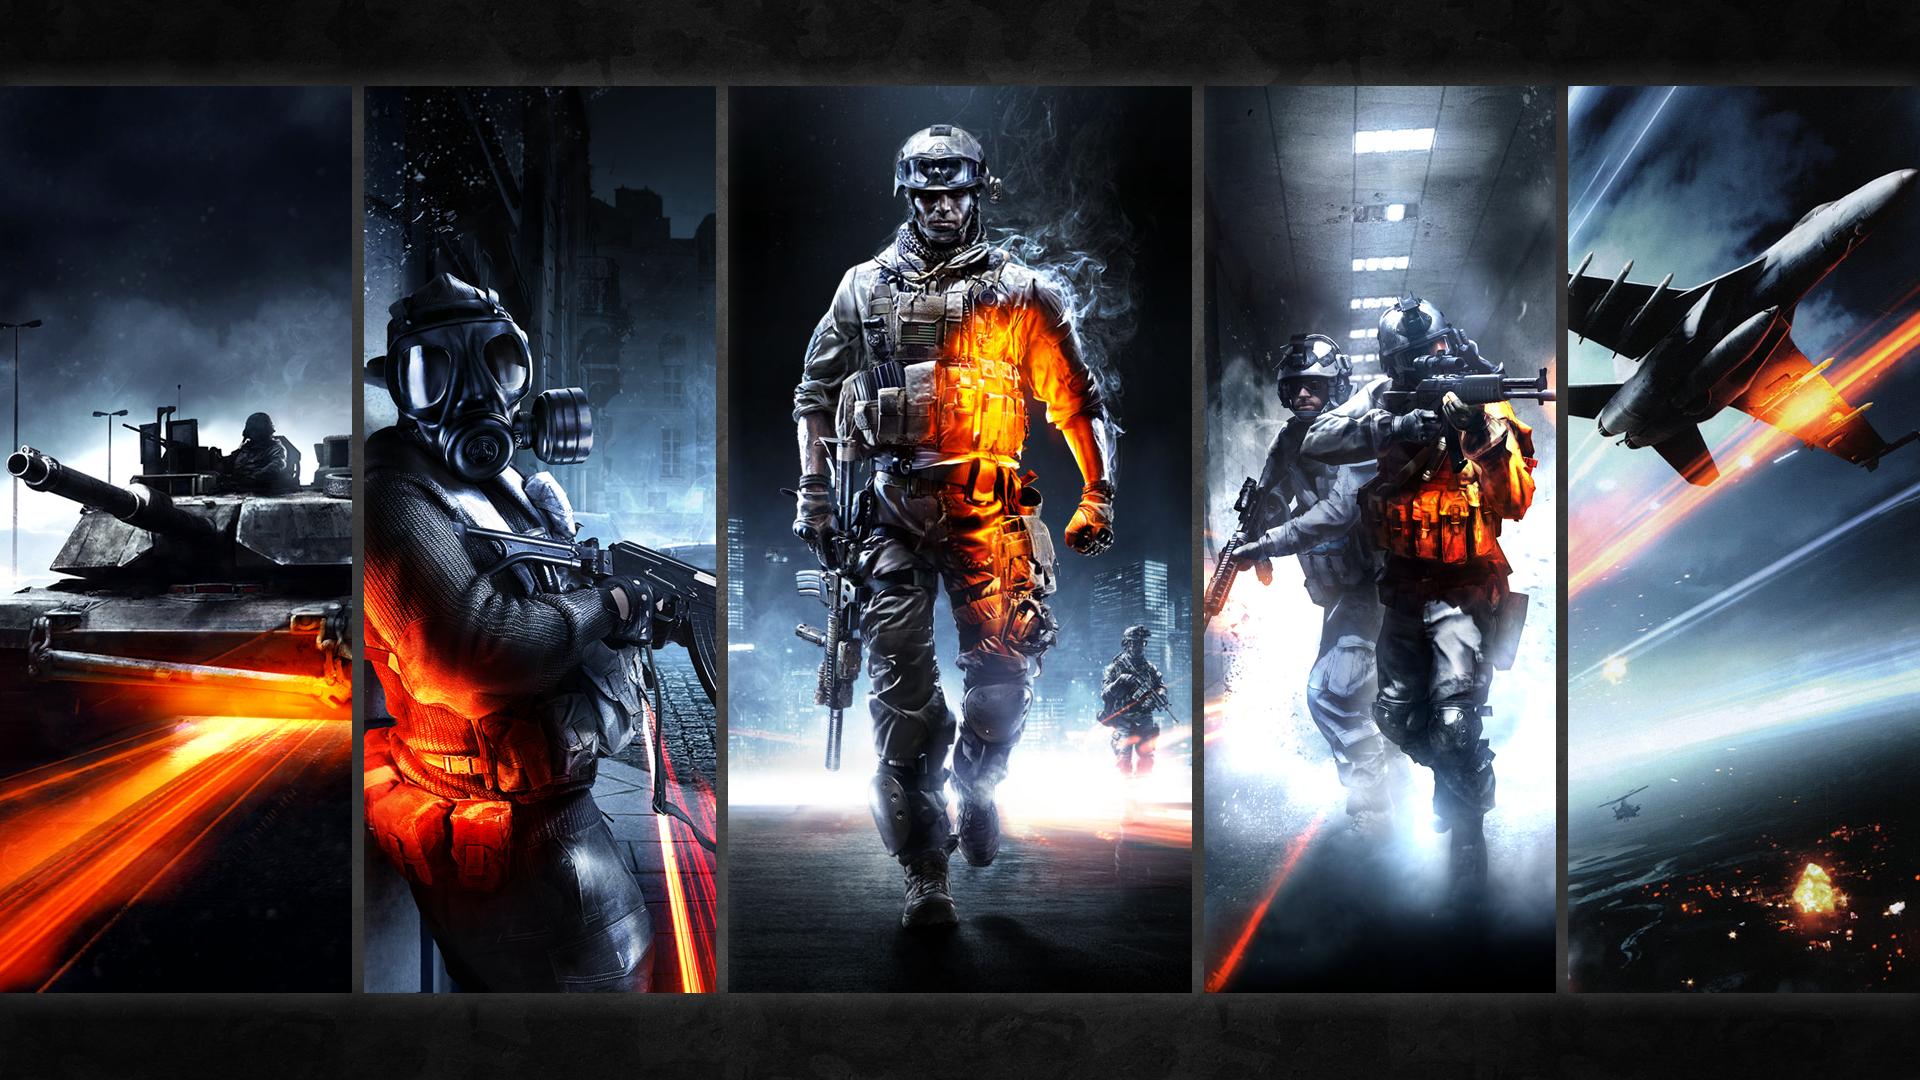 167 Battlefield 4 HD Wallpapers | Backgrounds - Wallpaper Abyss